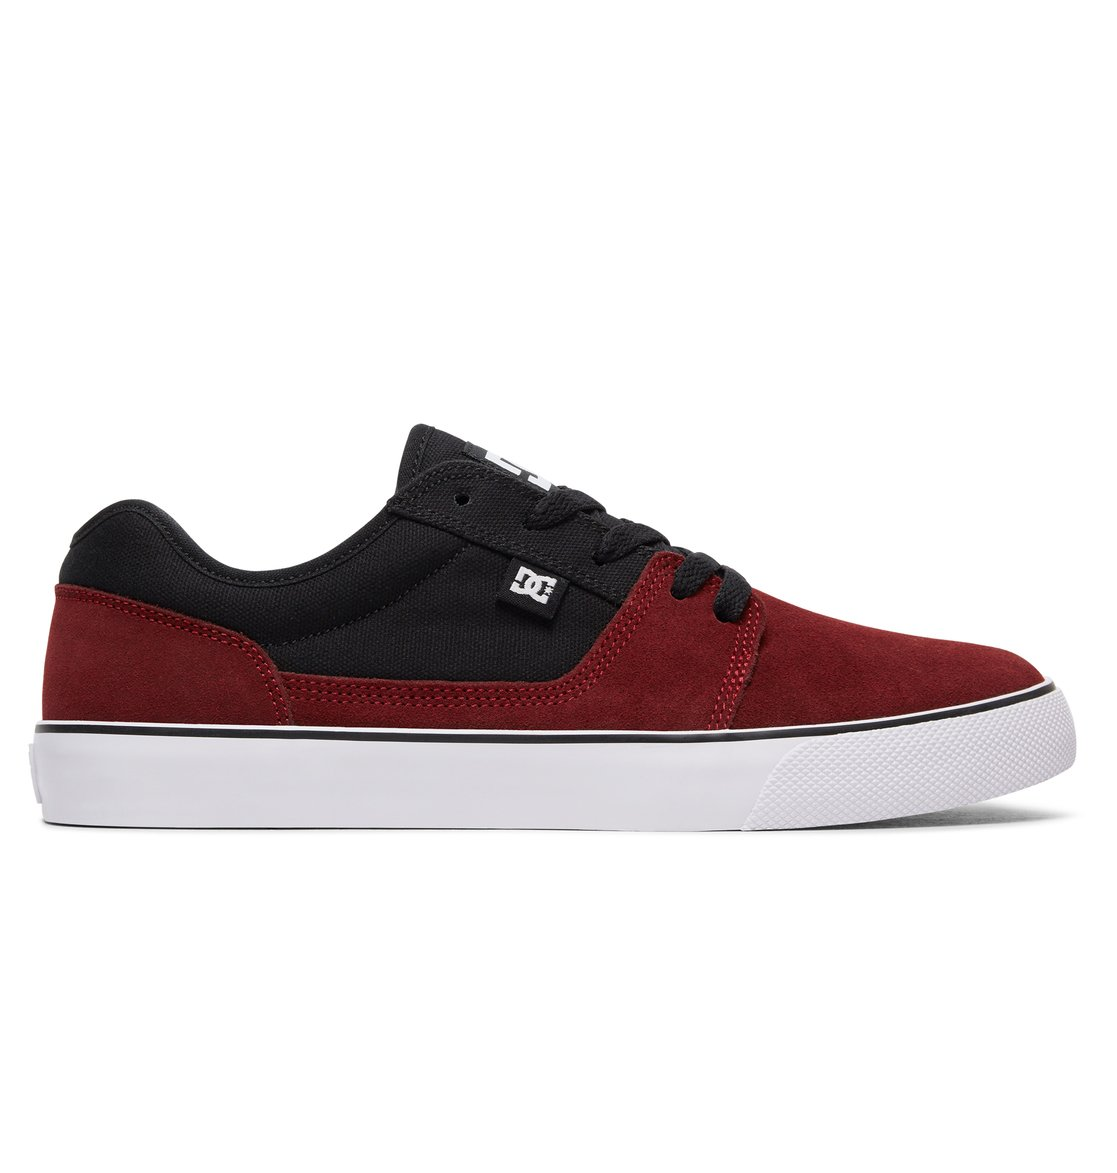 Zapatos DC Shoes Tonik para hombre